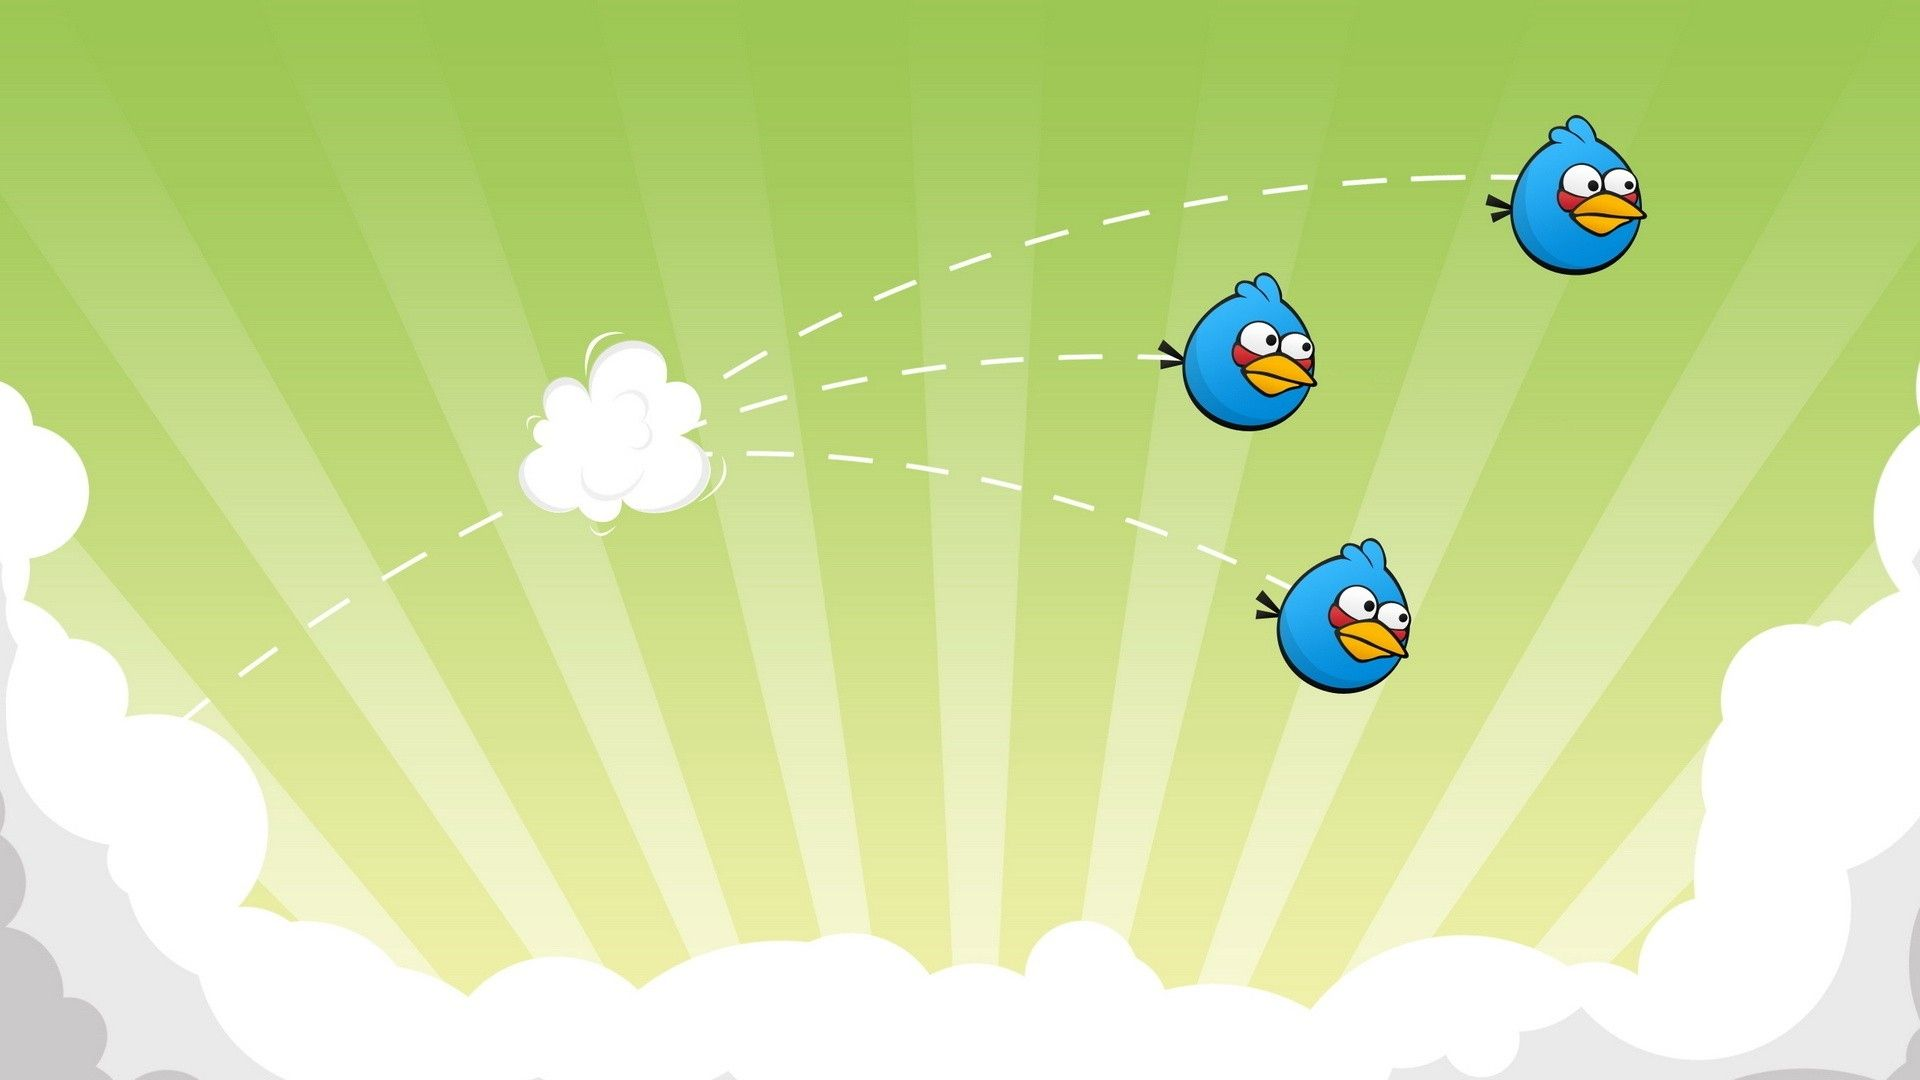 Angry Birds Splash Screen